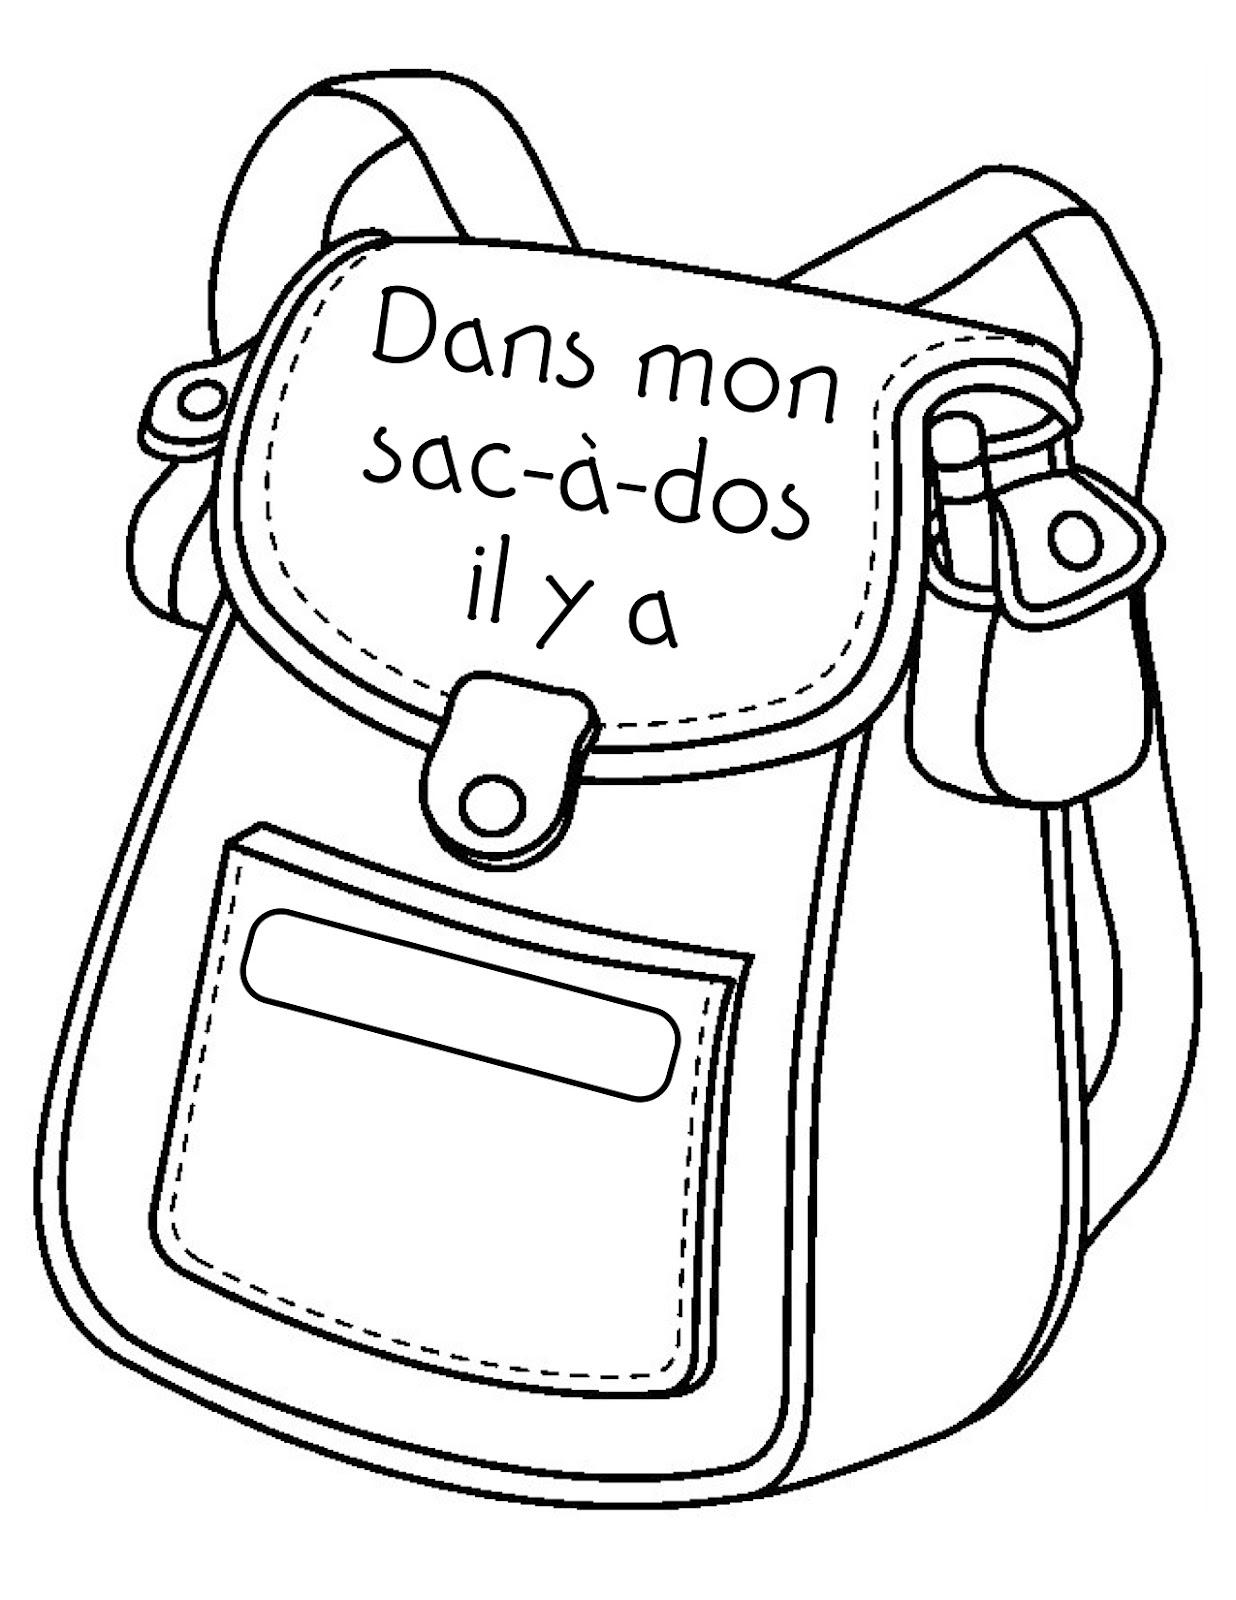 1º ESO y Dans à a dos mon il sac qCwfrdHqx4